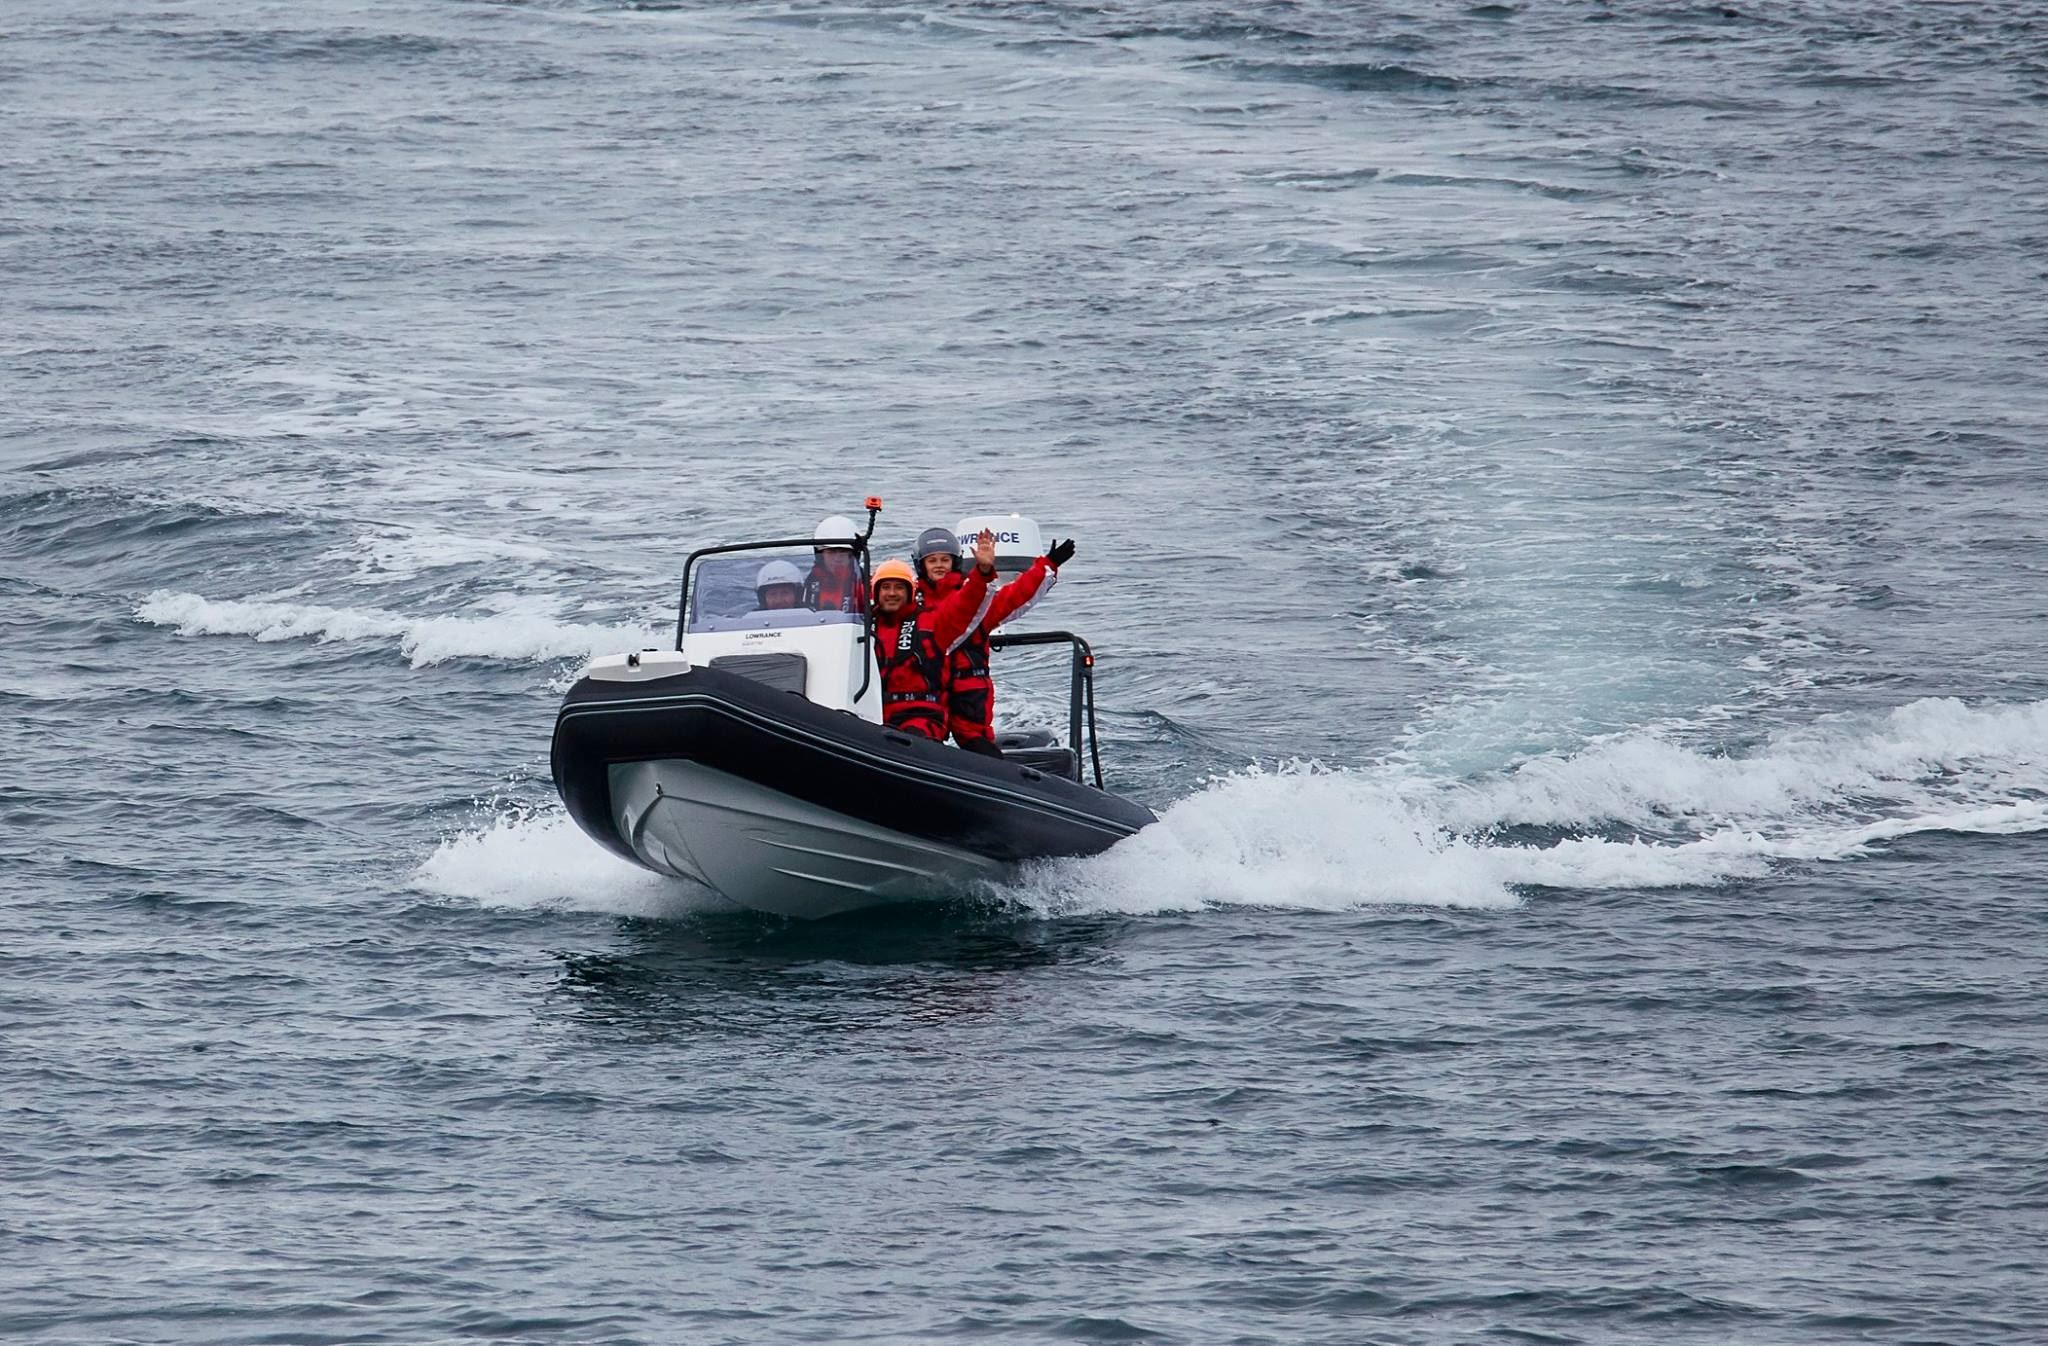 RIB-Boat excursion to beautiful Hella